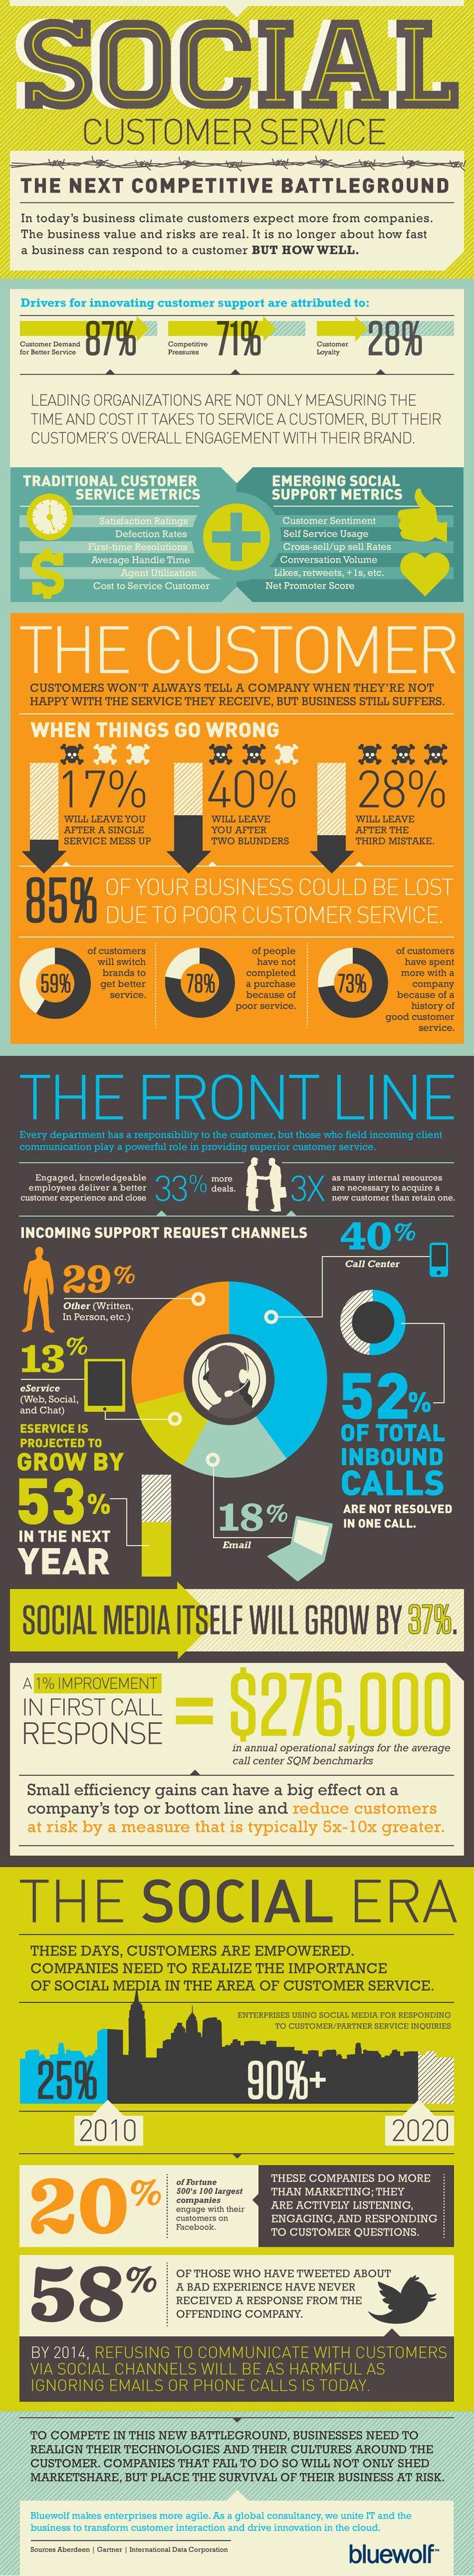 Social Customer Service - The Next Competitive Battleground #socialmedia #infographic